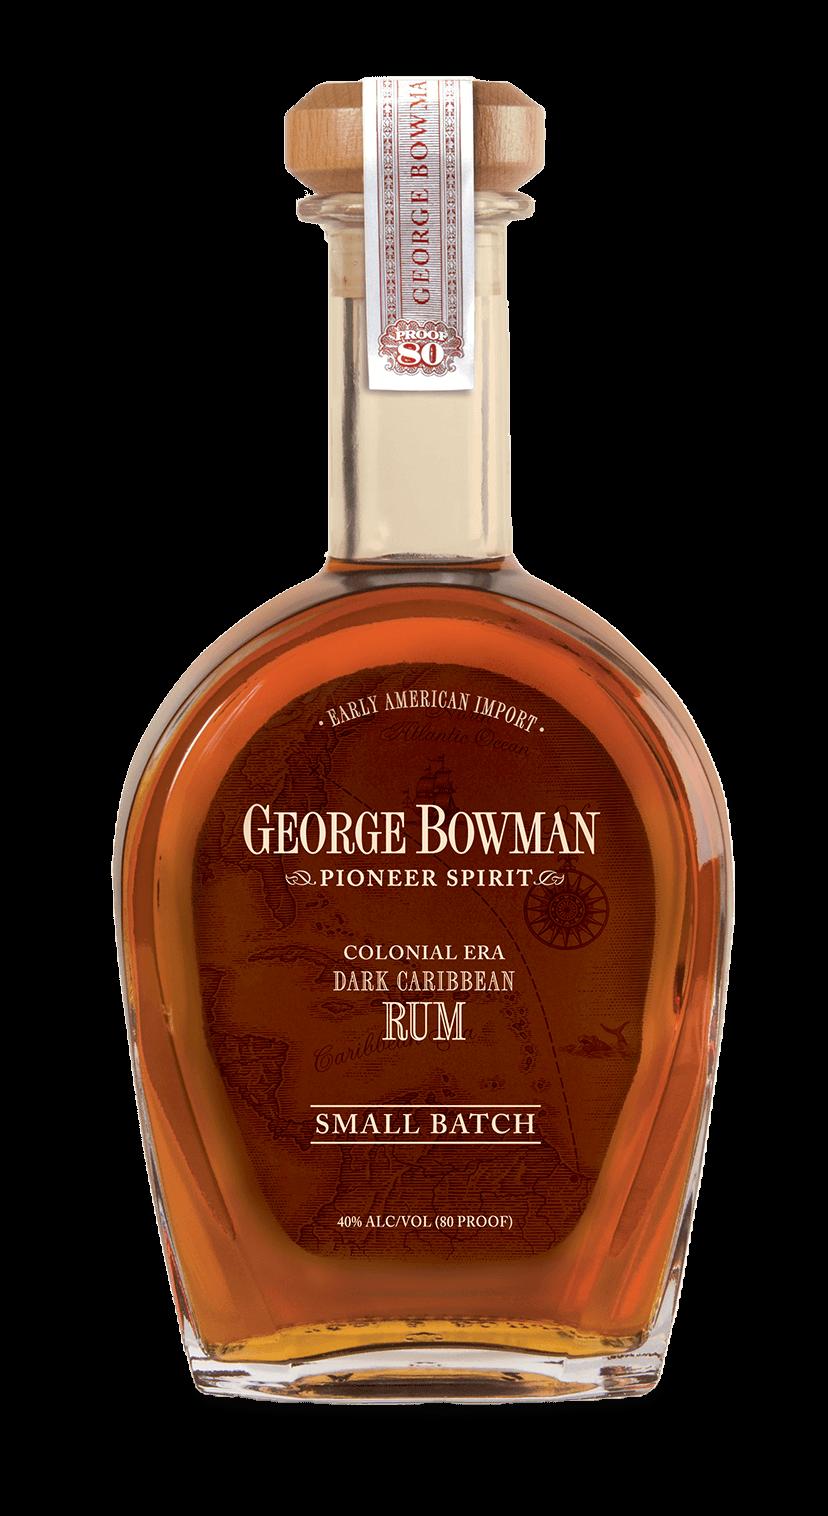 George Bowman | Small Batch Colonial Era Dark Caribbean Rum | A. Smith Bowman Distillery